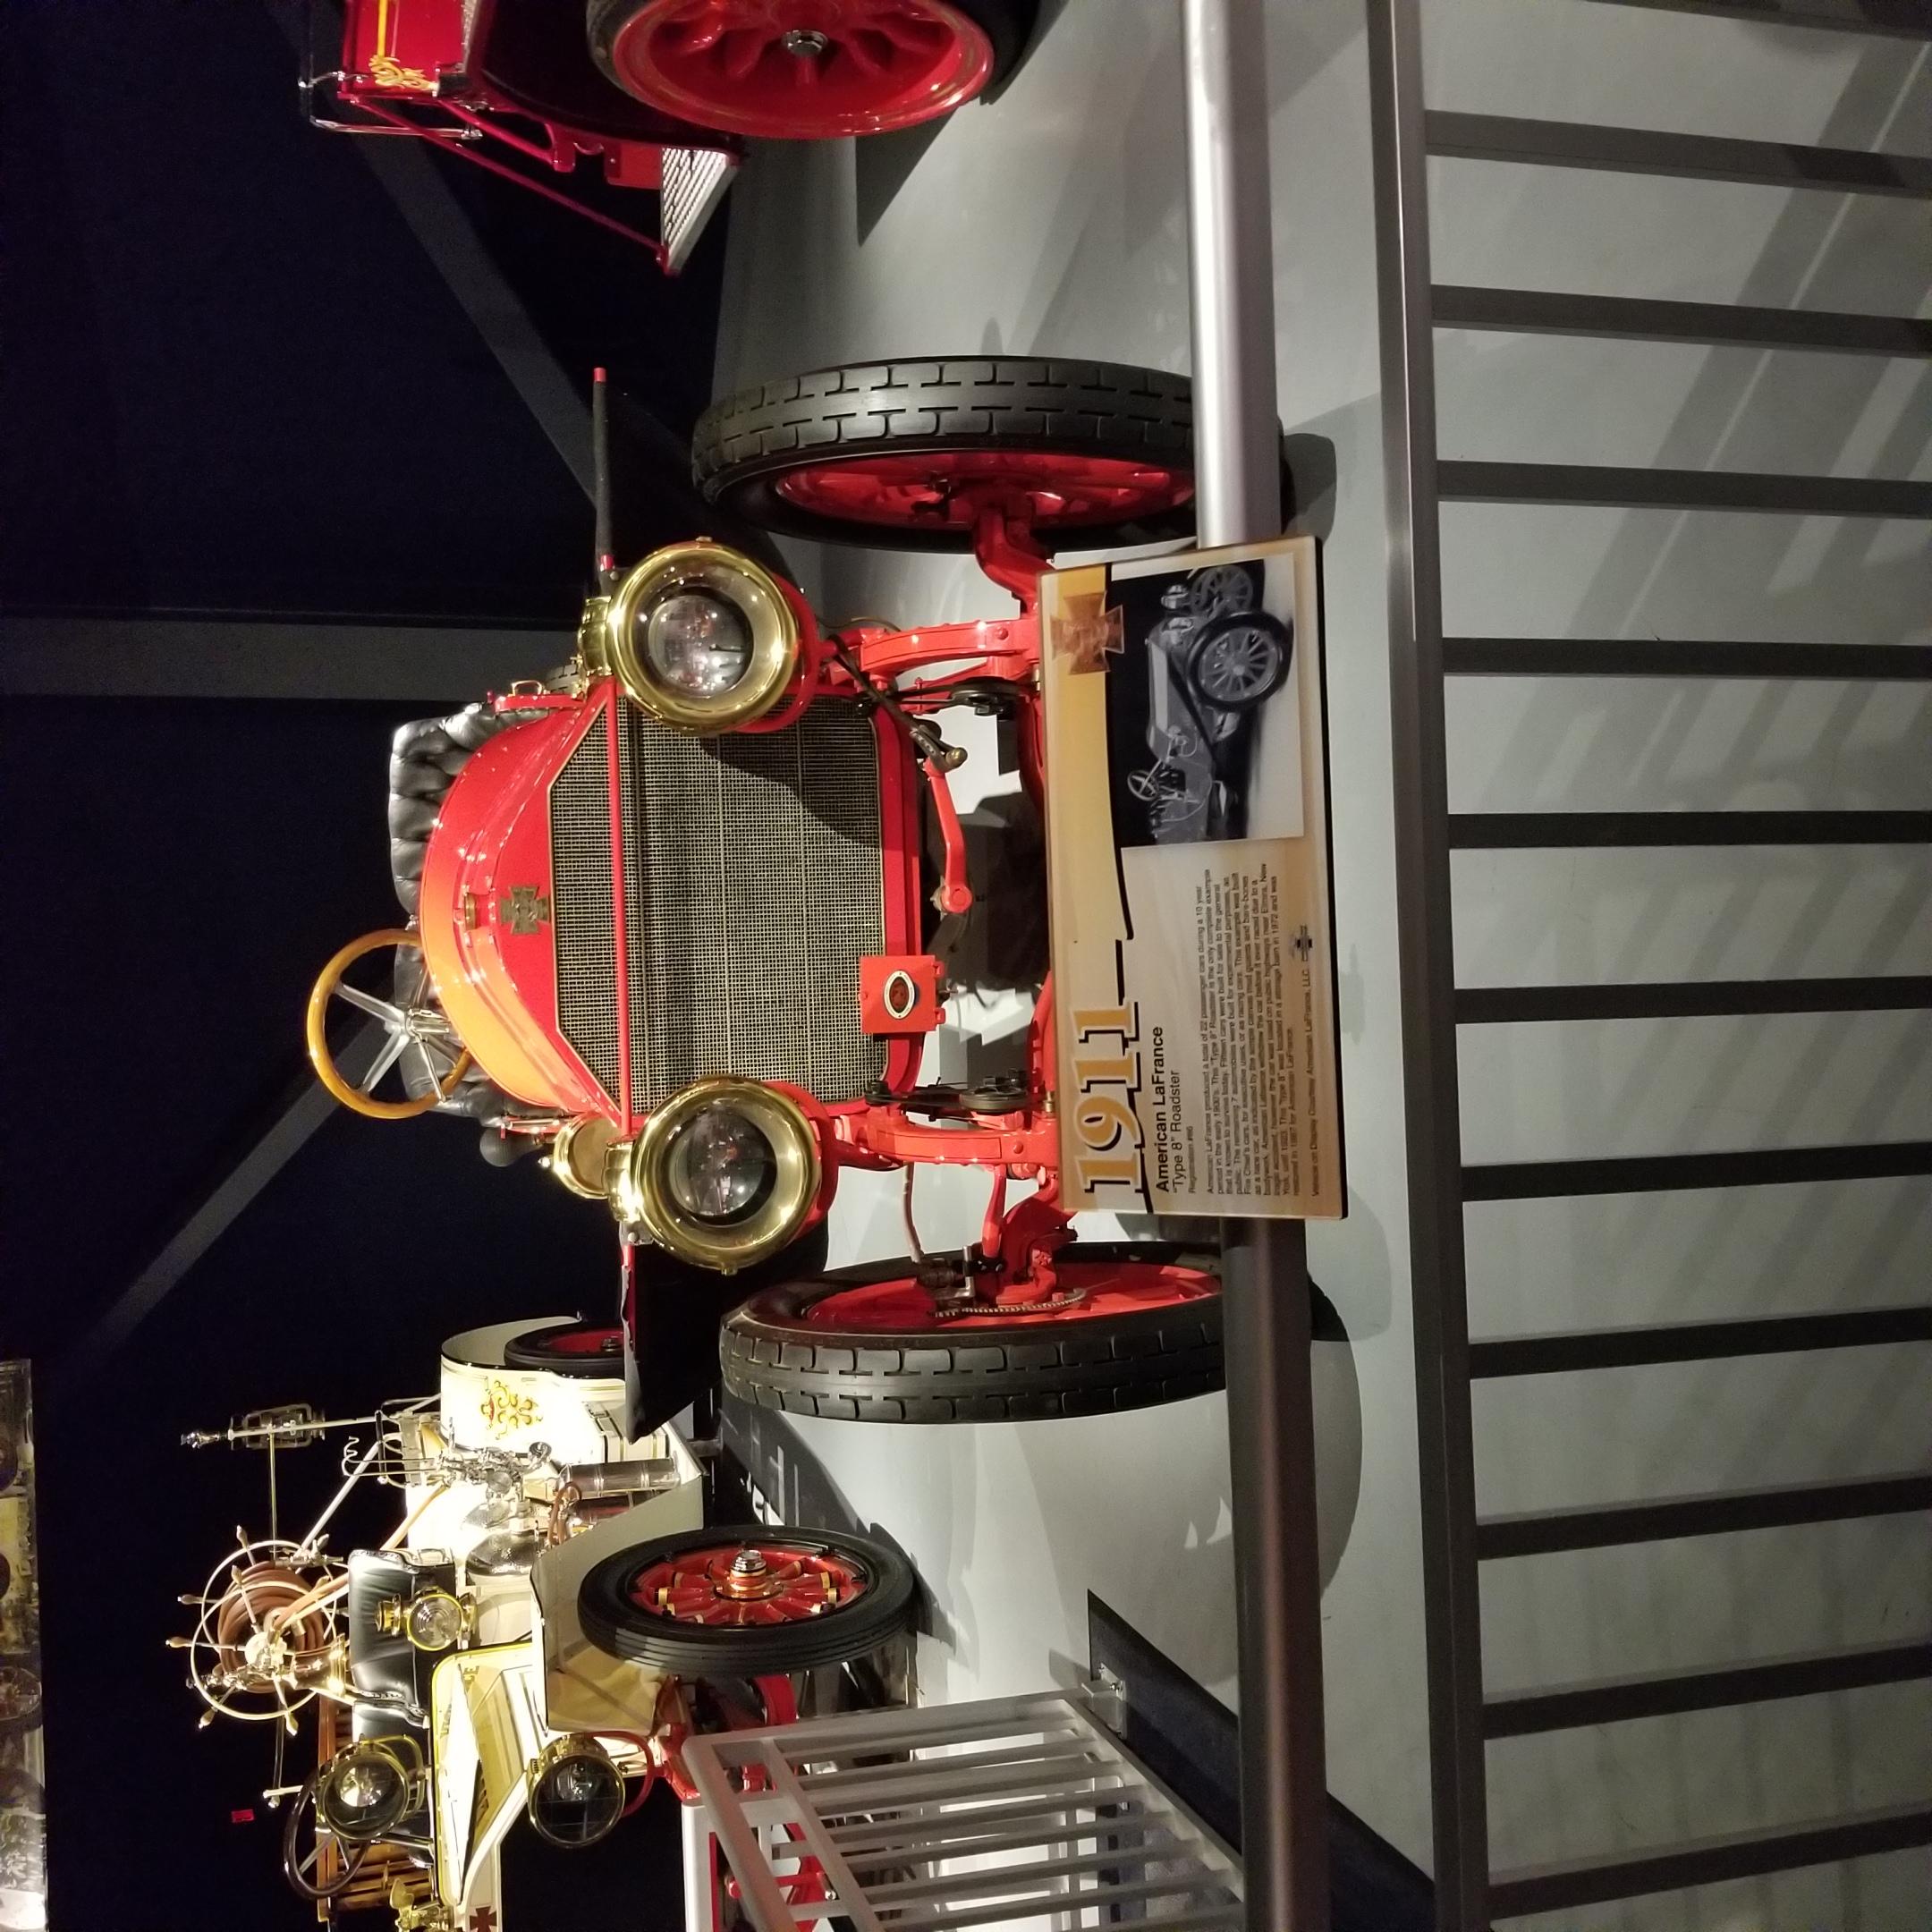 Fire Trucks from 1911-20190406_103032.jpg